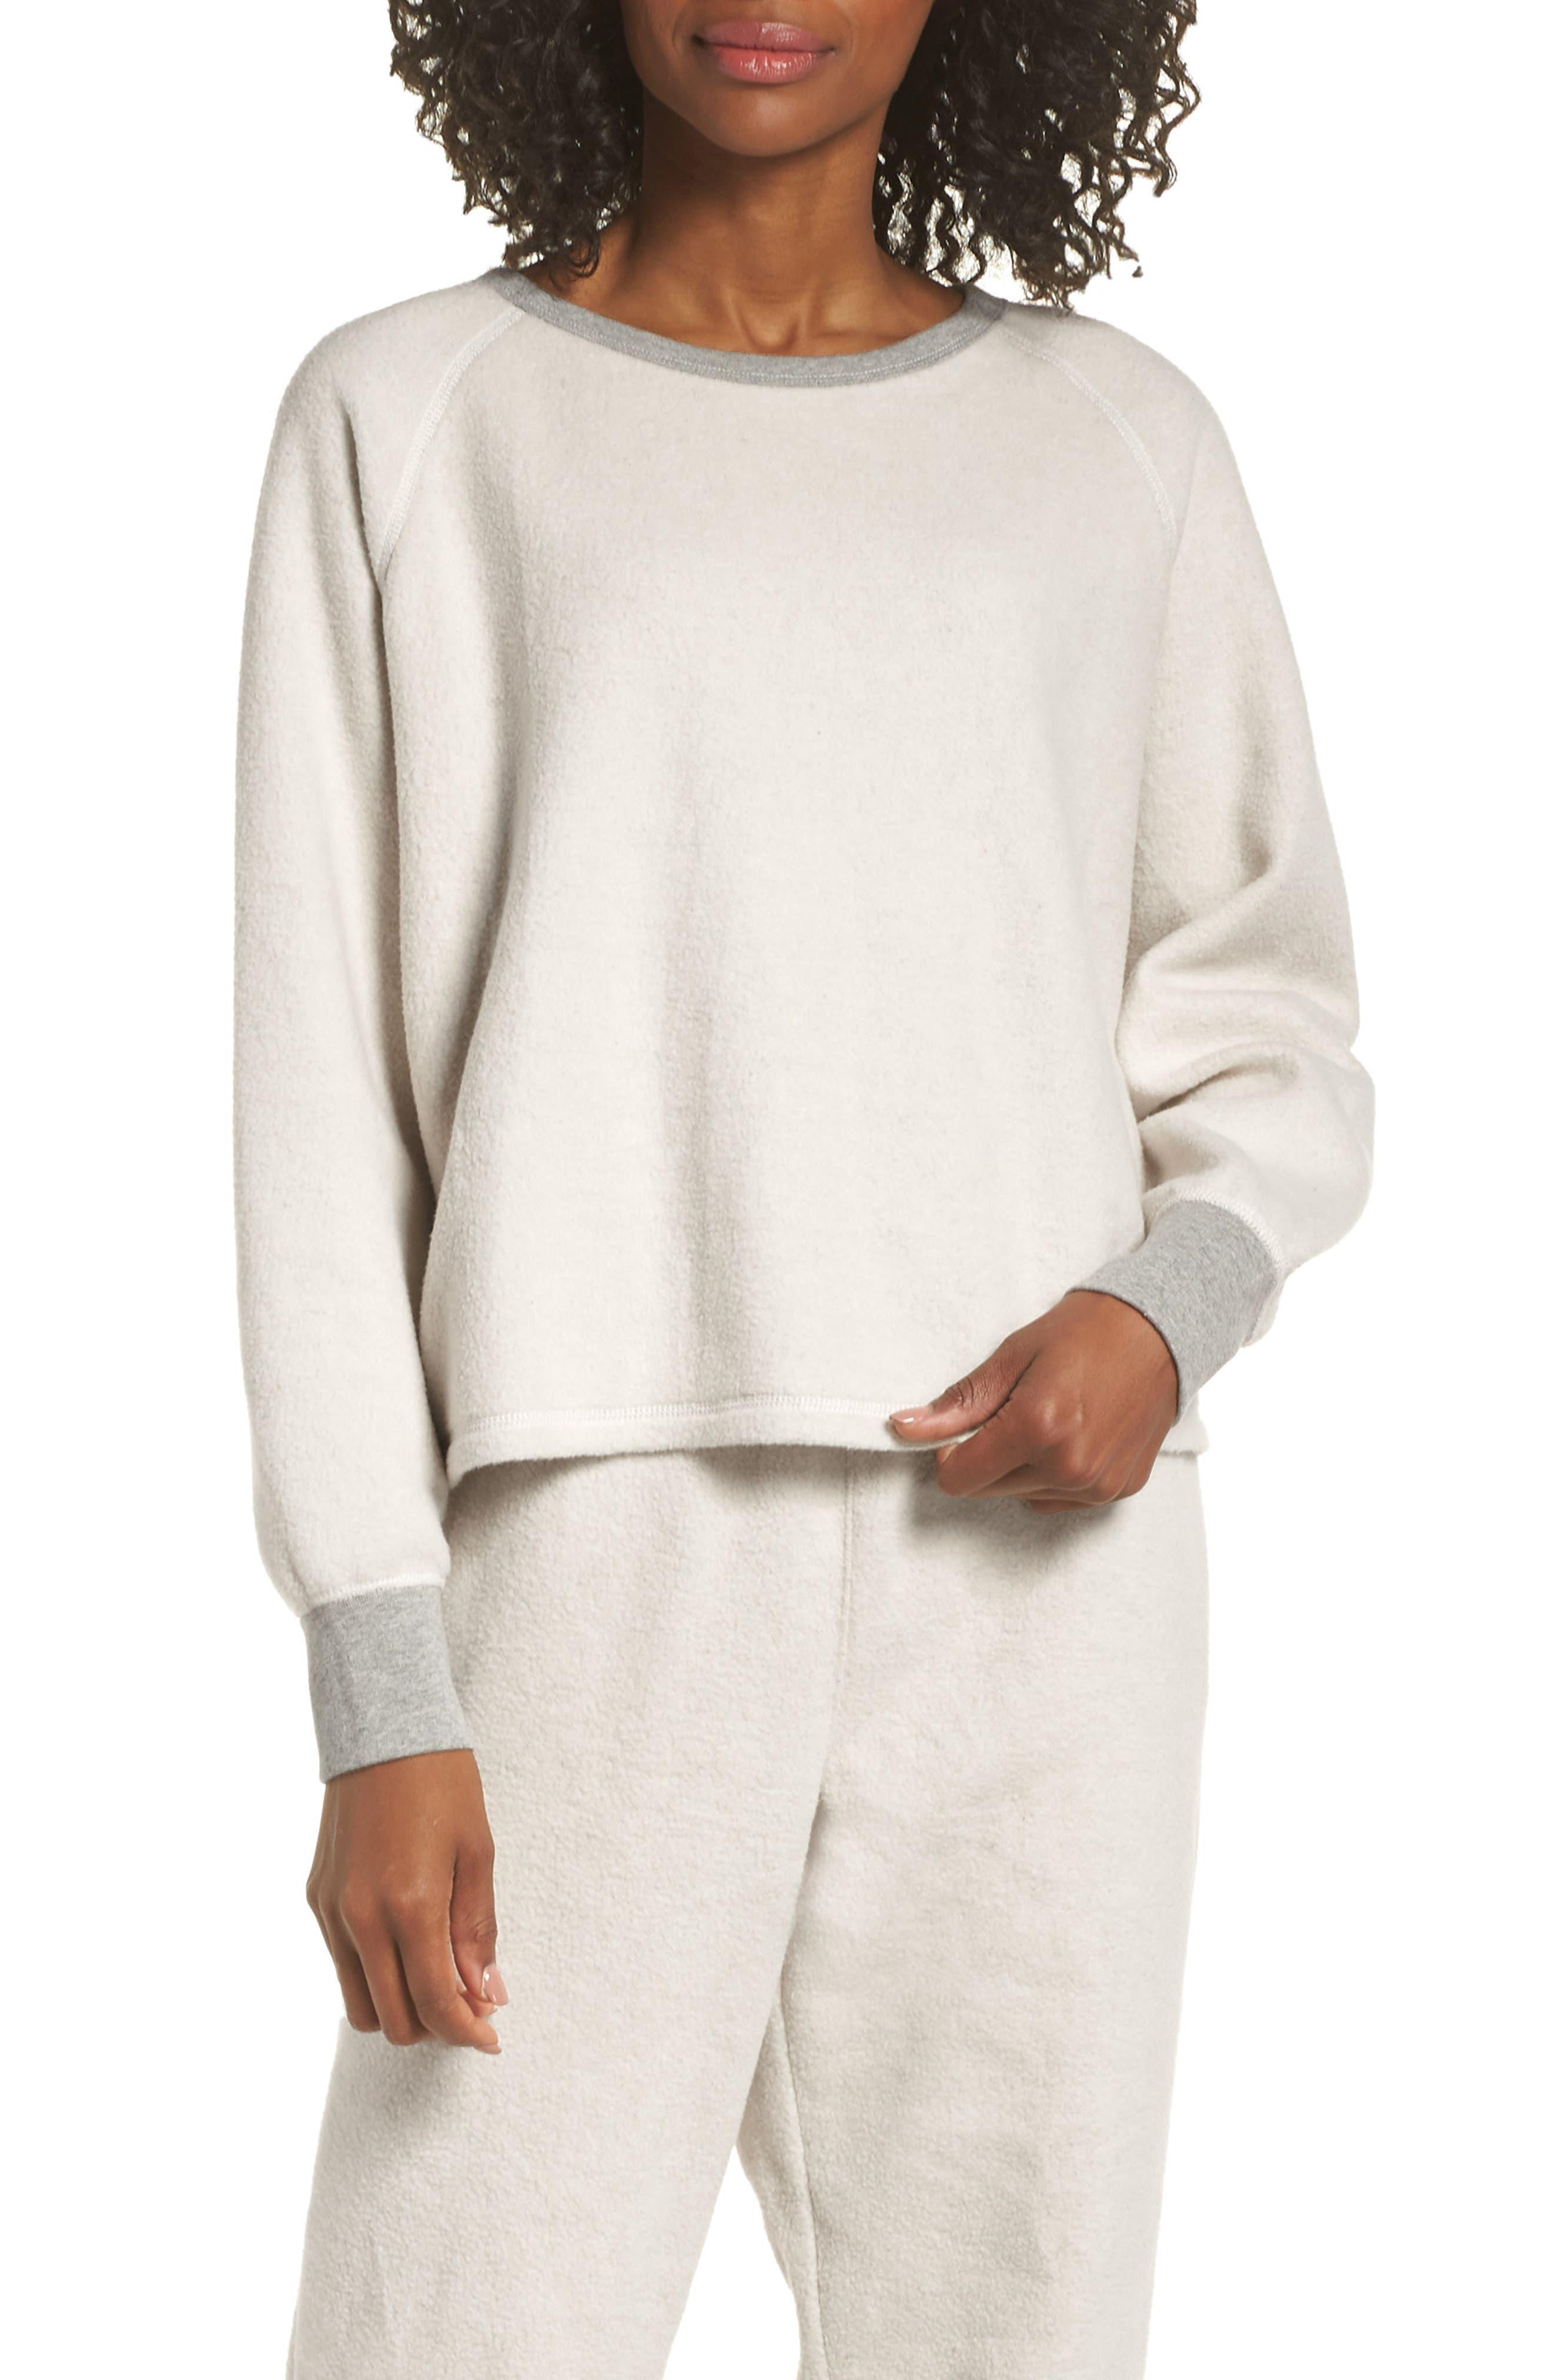 MADEWELL, Fleece Pajama Sweatshirt, Main thumbnail 1, color, 020